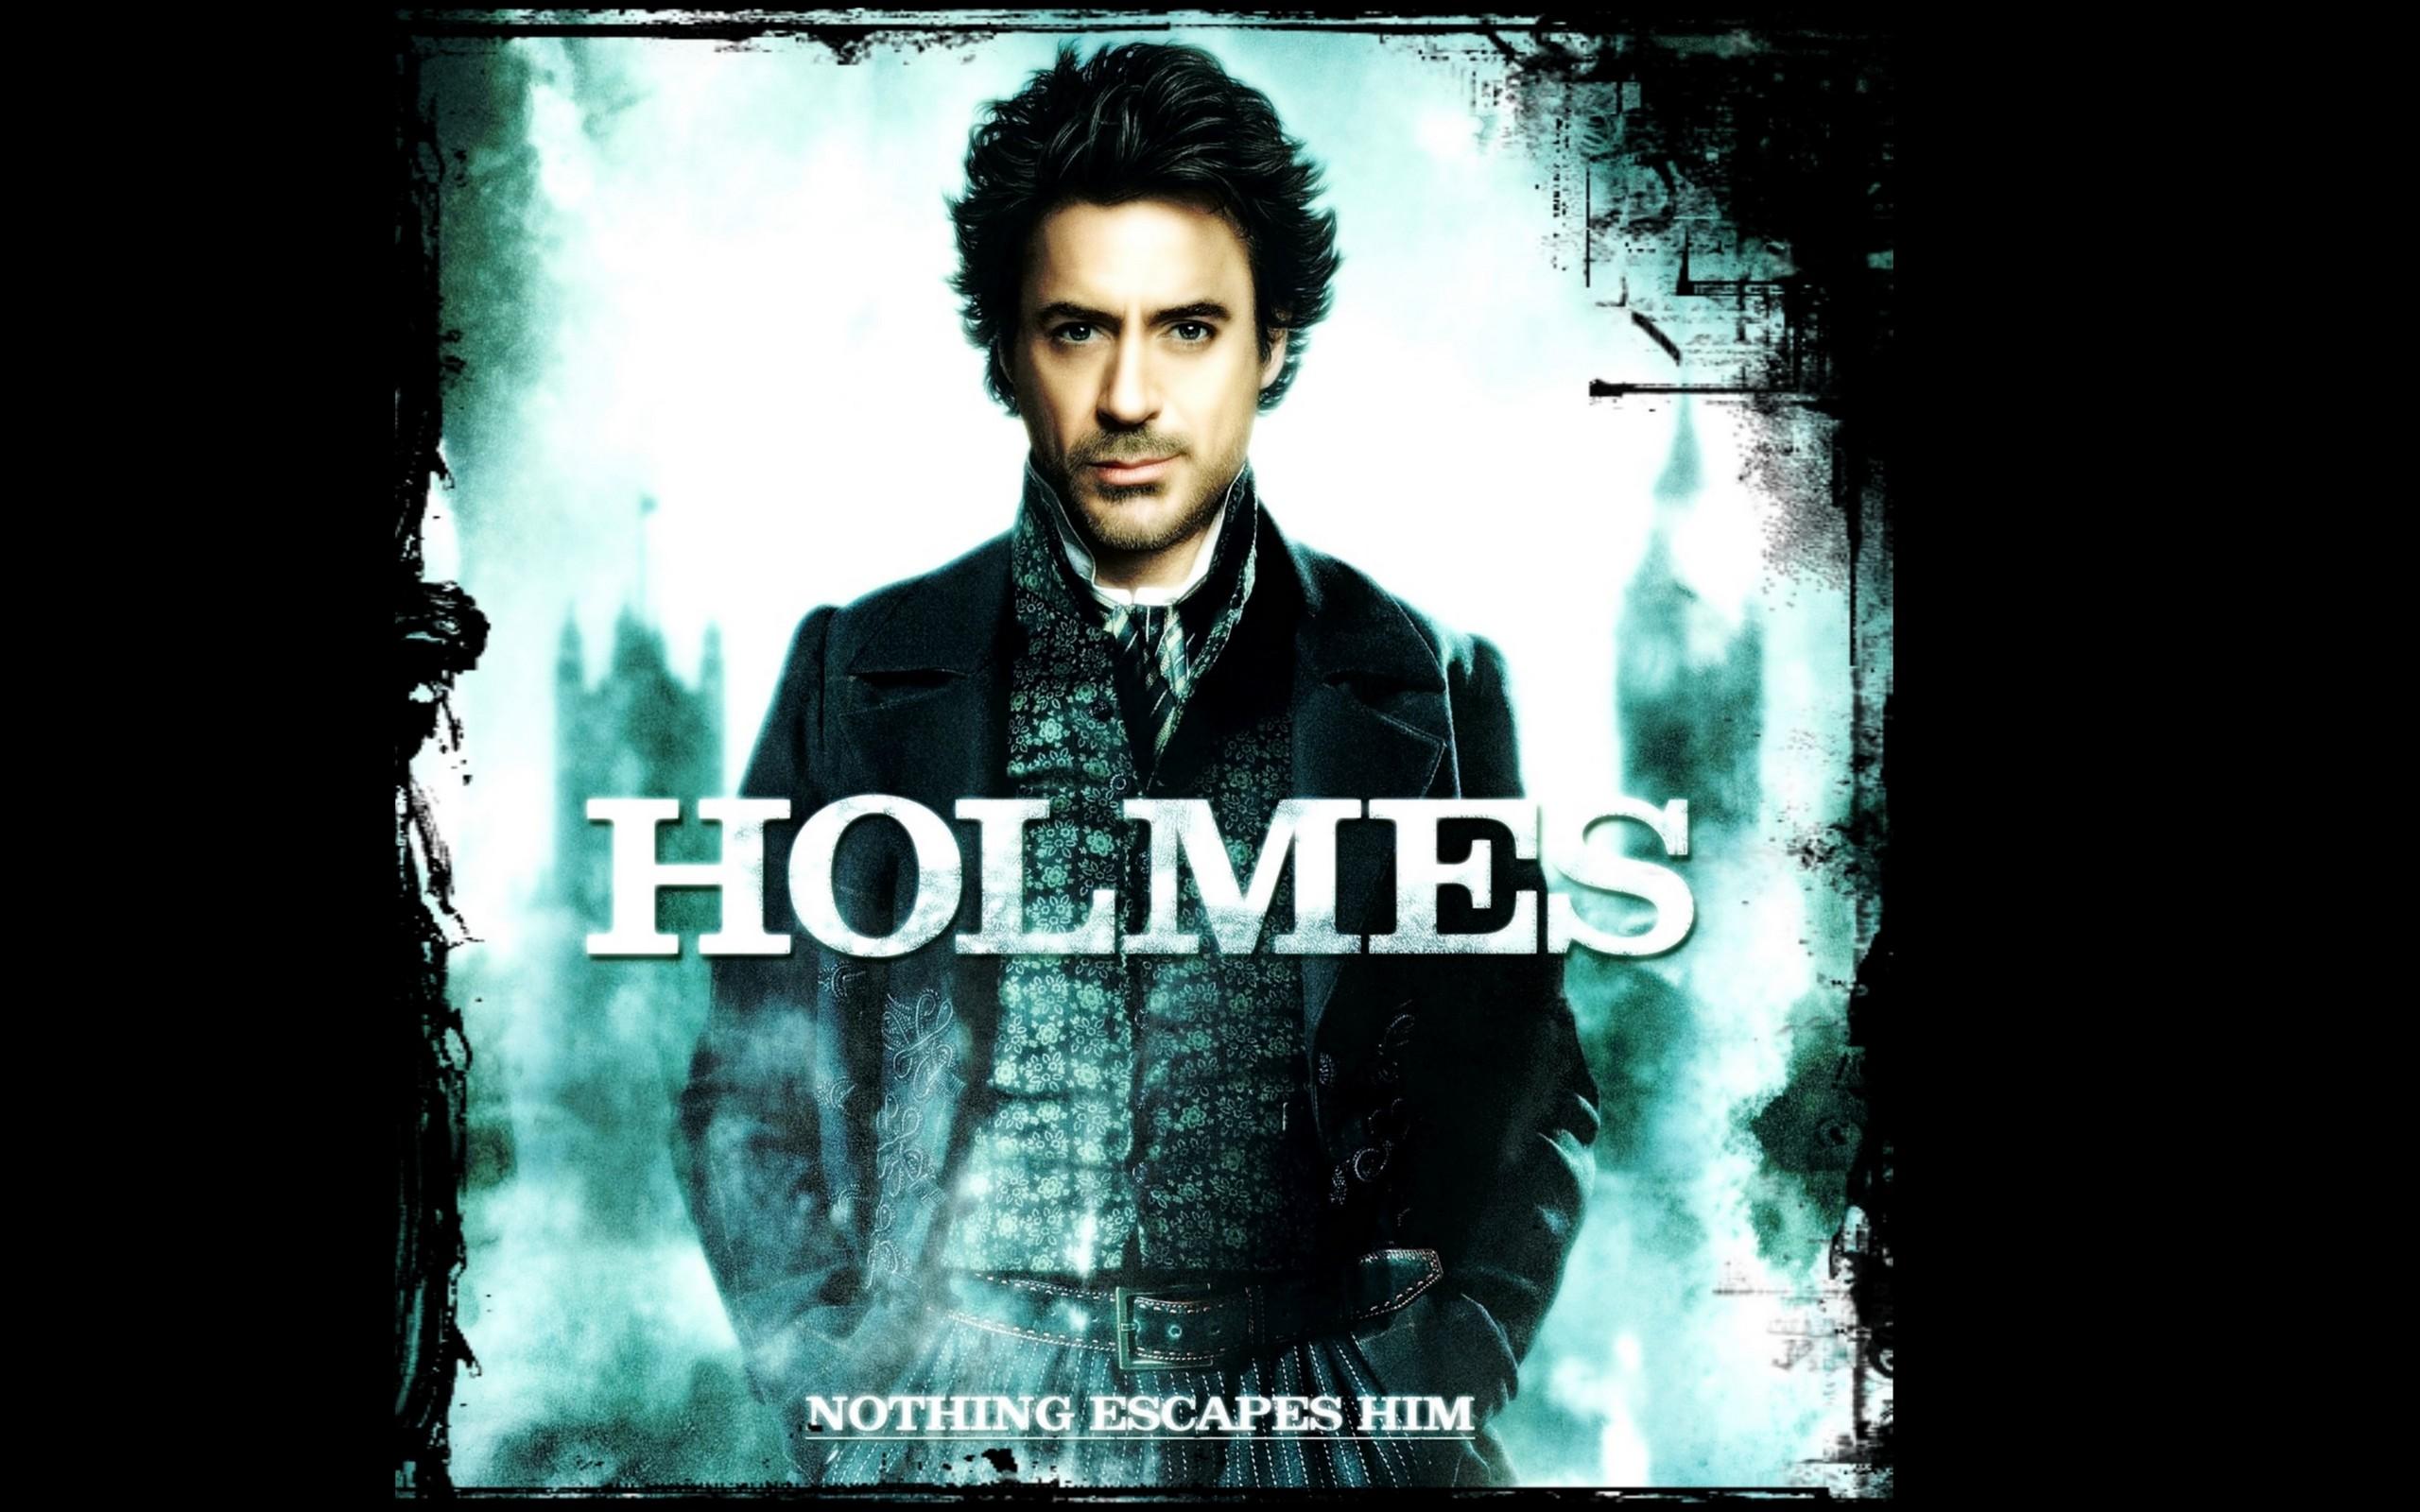 Free Download Robert Downey Jr As Sherlock Holmes Images Holmes Hd